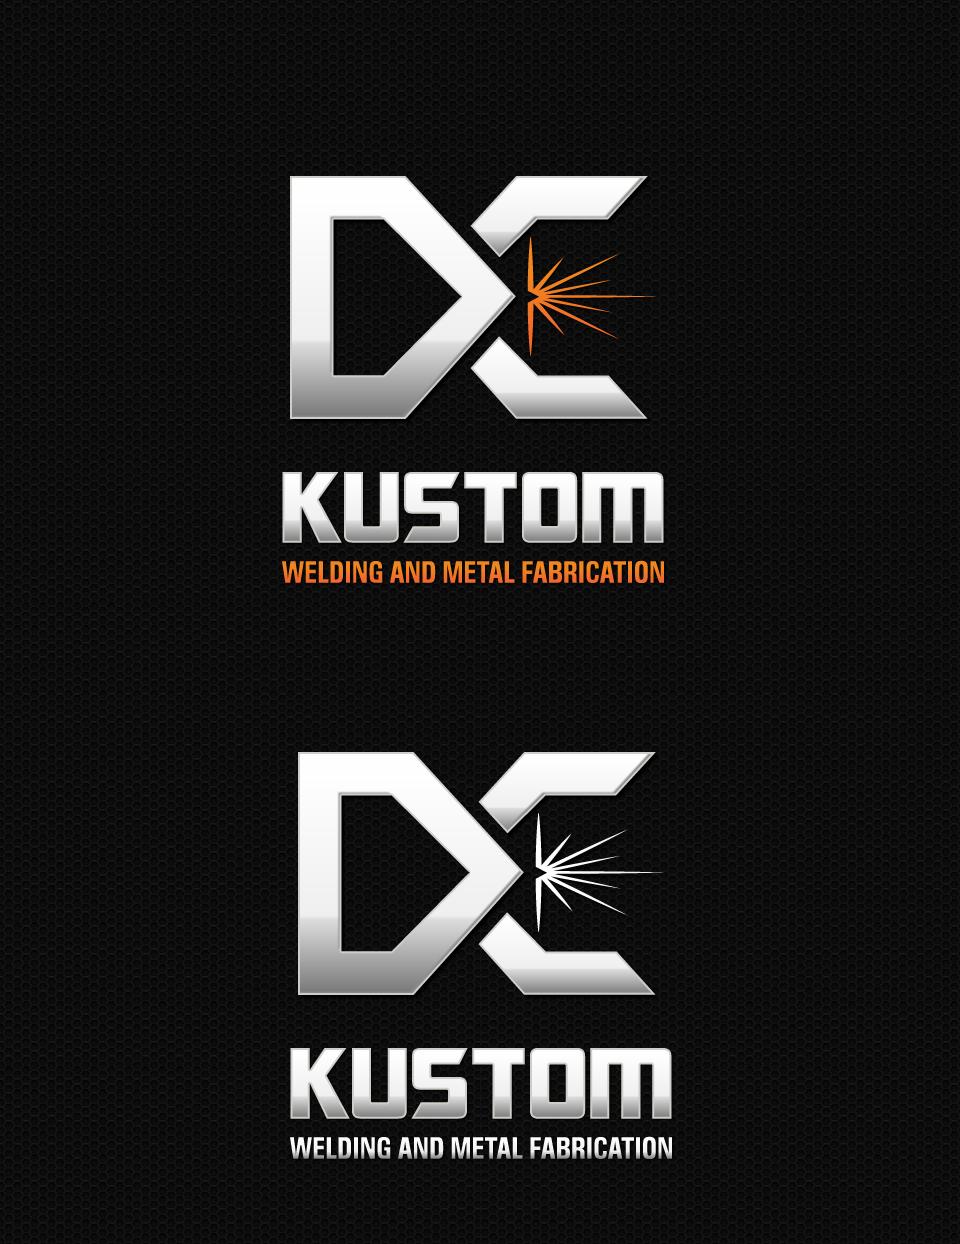 Logo Design by DesignReal - Entry No. 196 in the Logo Design Contest Imaginative Logo Design for DC KUSTOM WELDING & METAL FABRICATION.